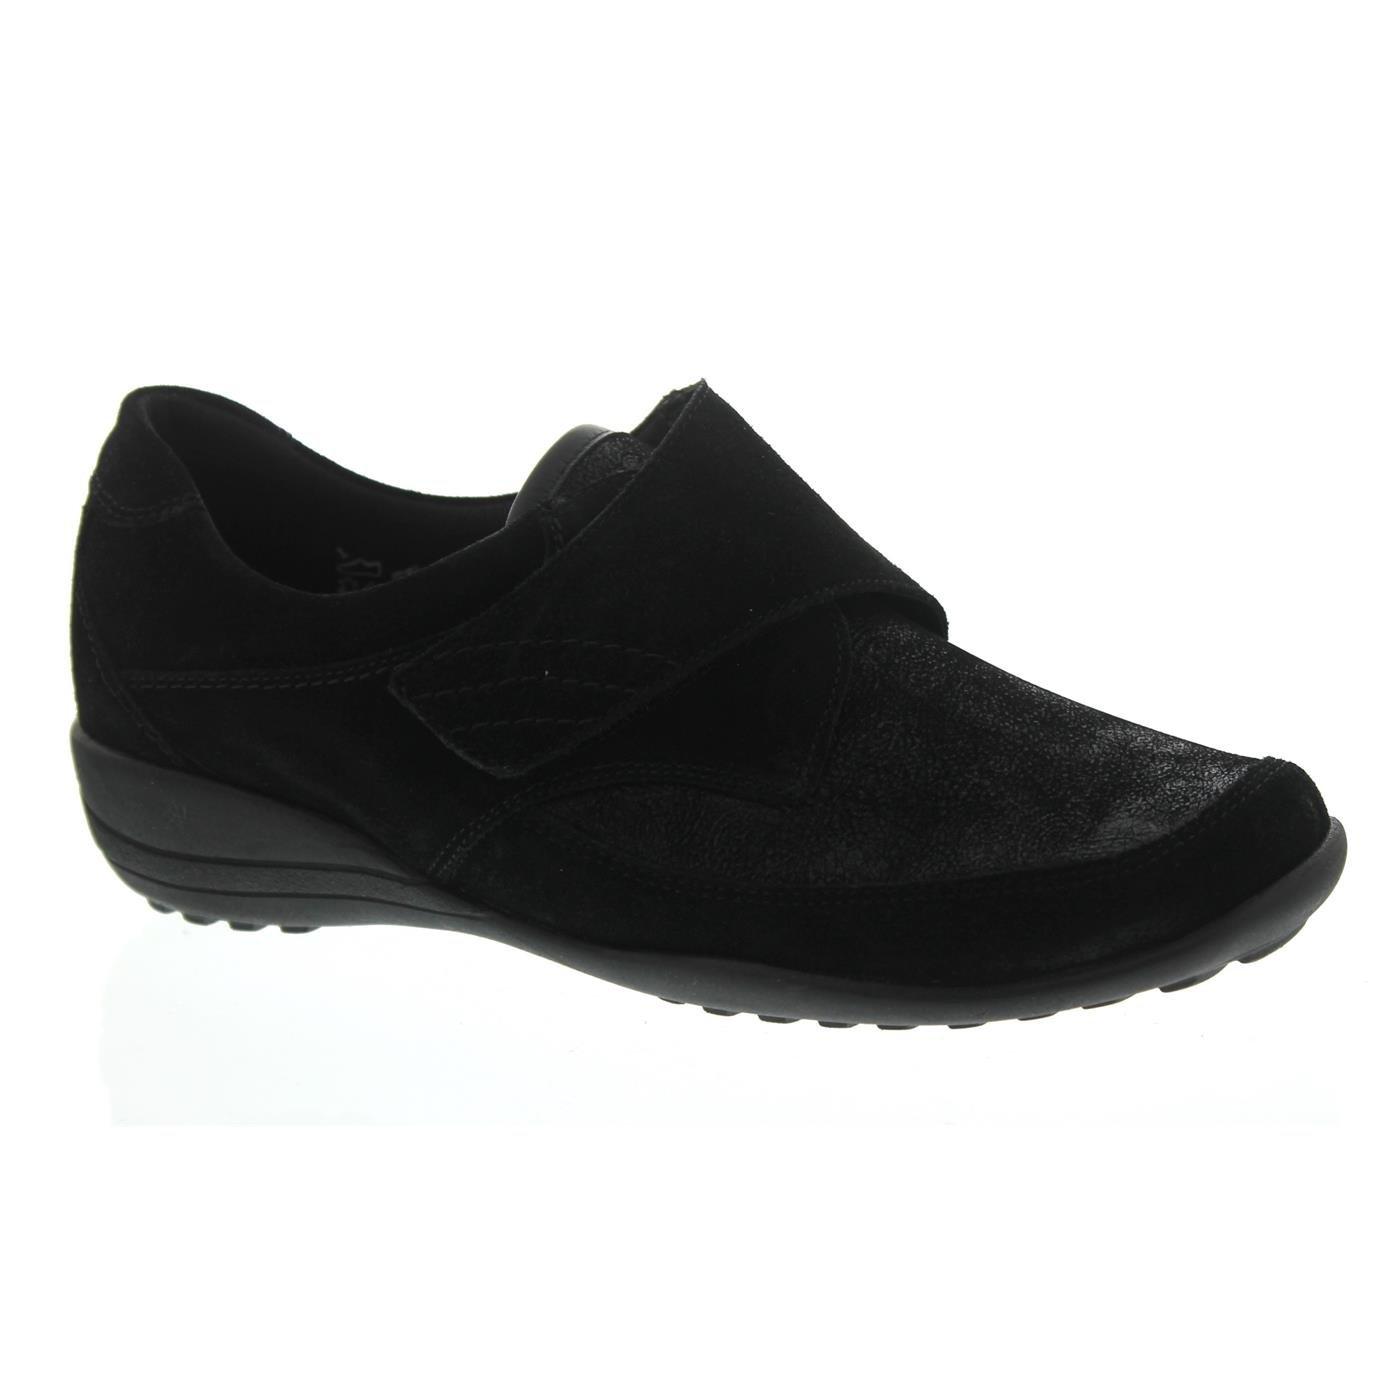 Waldläufer Mujeres Zapatos Planos Schwarz Negro, (Schwarz) K01304-309-001 38|schwarz